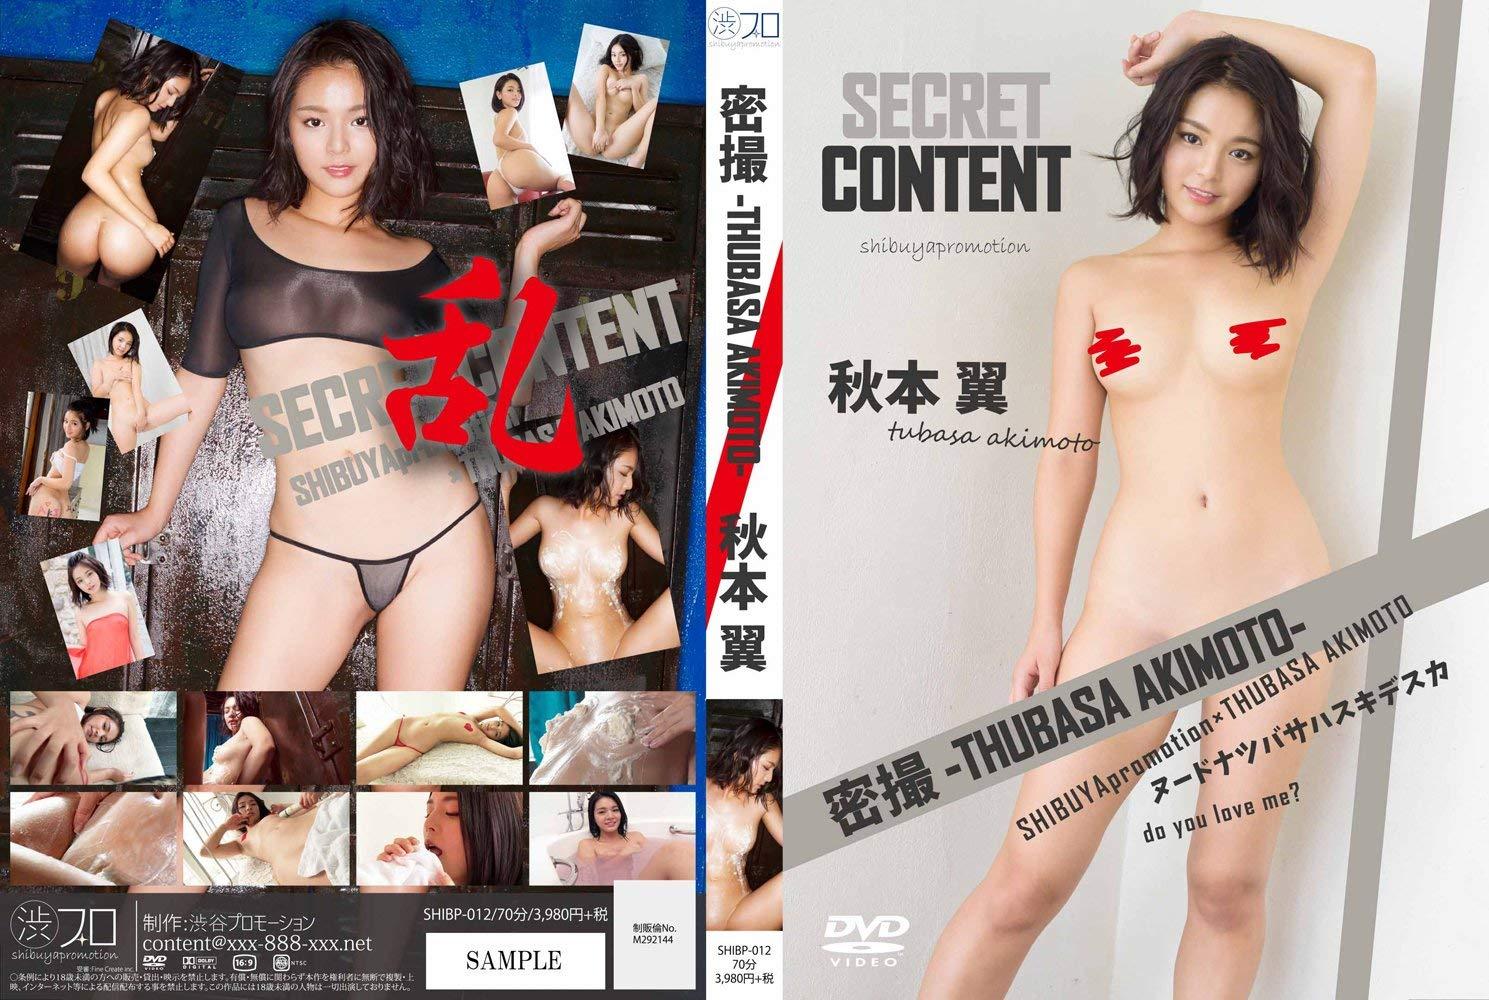 [SHIBPB-012] Tsubasa Akimoto 秋本翼 – Secret Content Close Photo Session 密撮